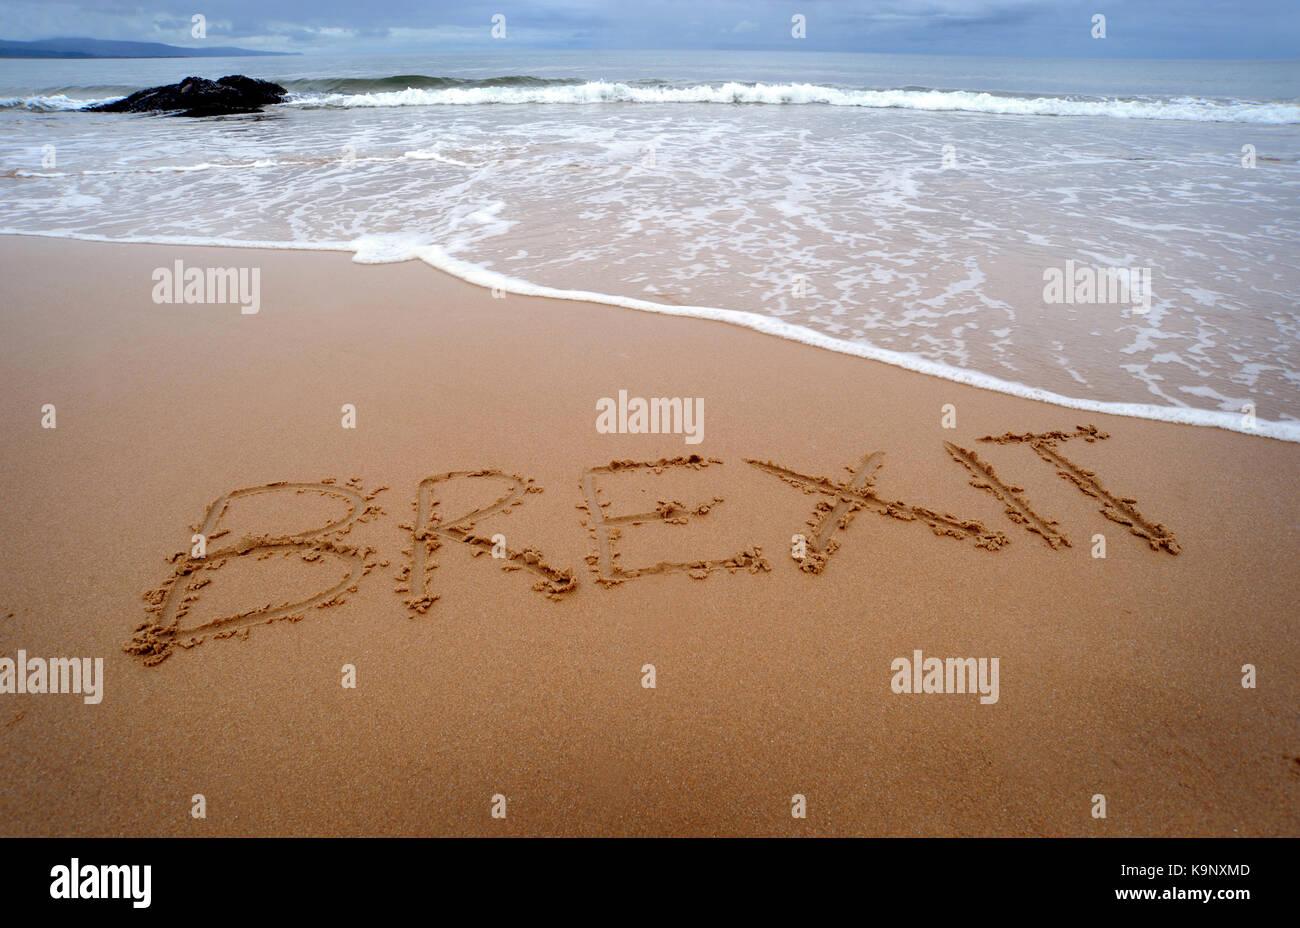 BREXIT WRITTEN IN SAND ON BRITISH BEACH UK - Stock Image